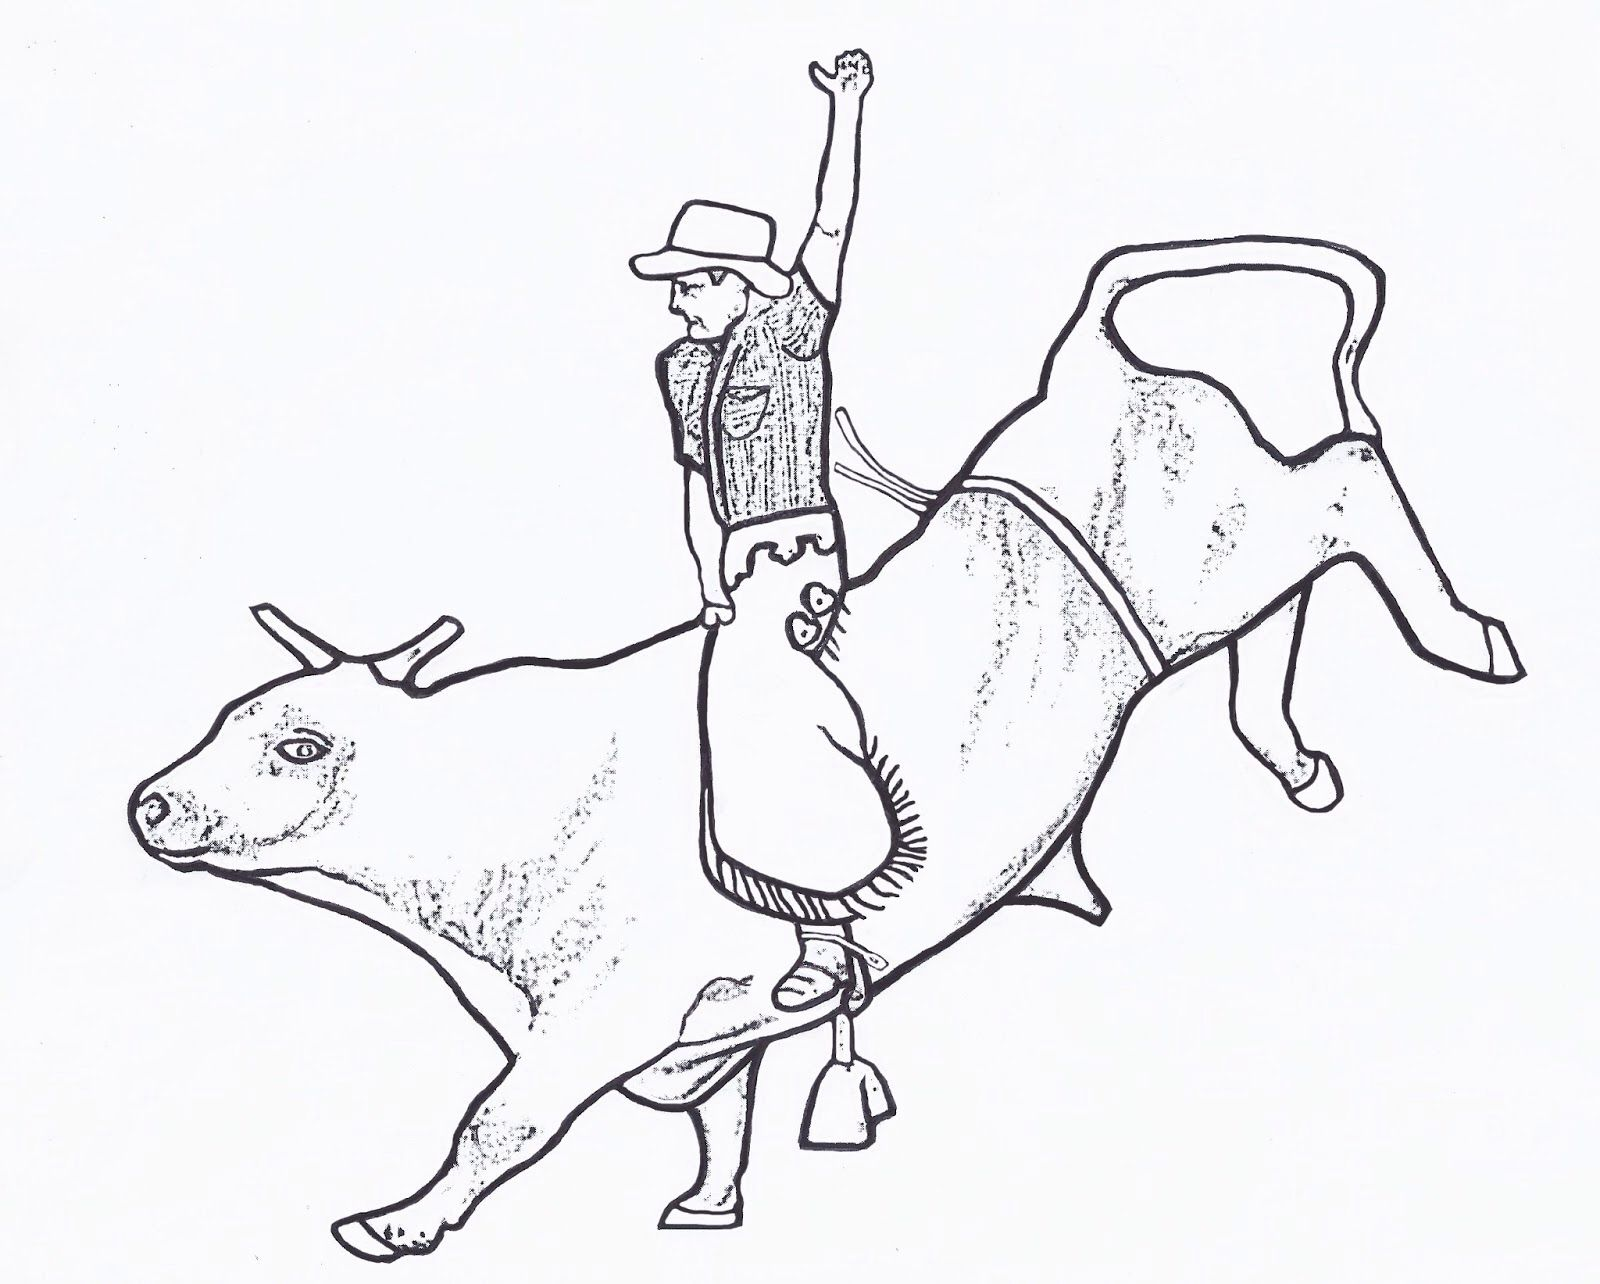 Image from http://mewarnai.us/images/642150-bull-rider